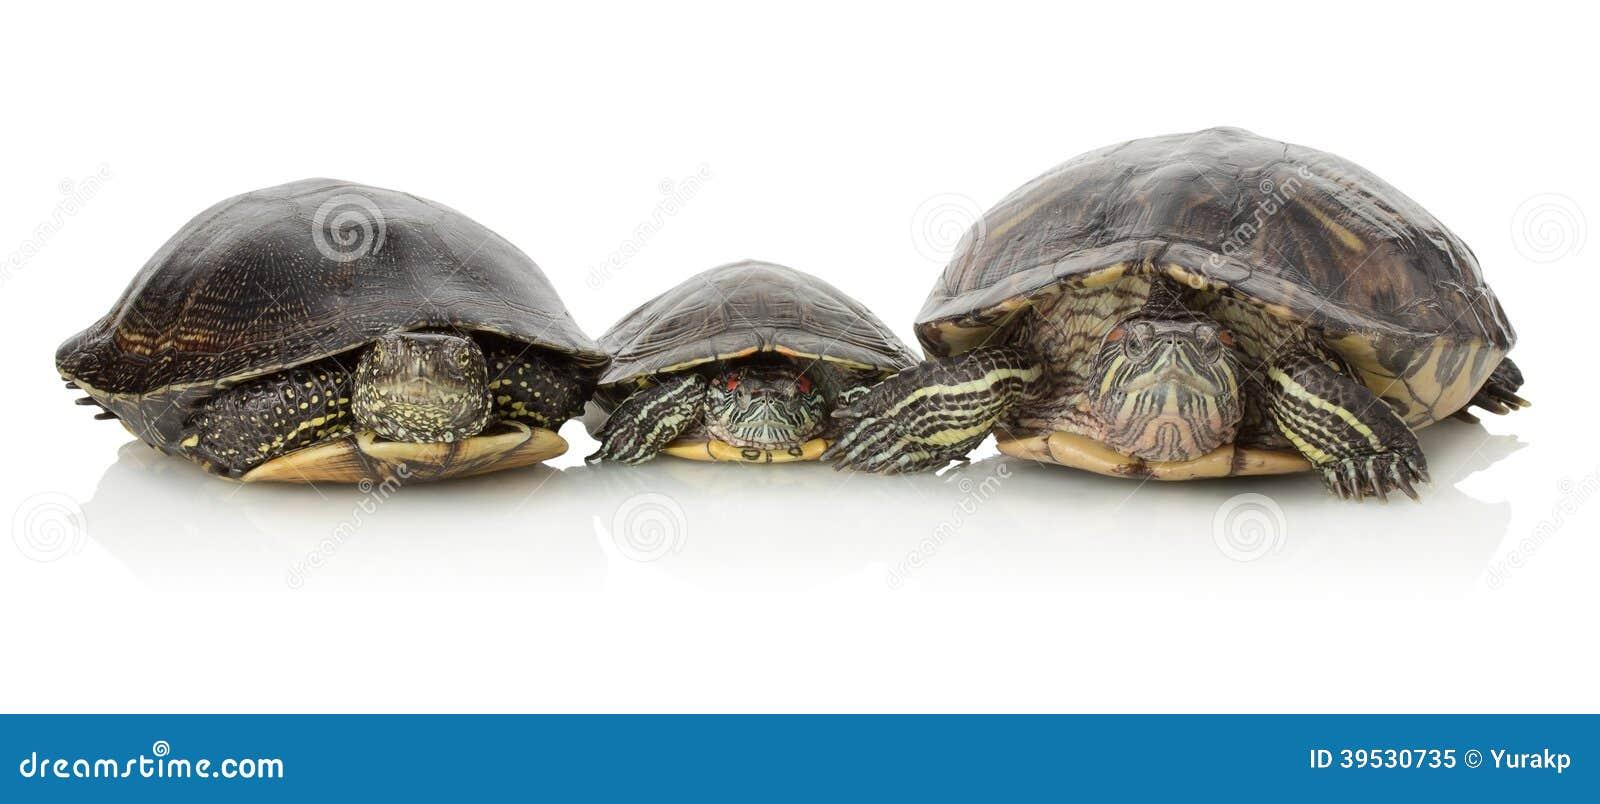 turtle white background - photo #21